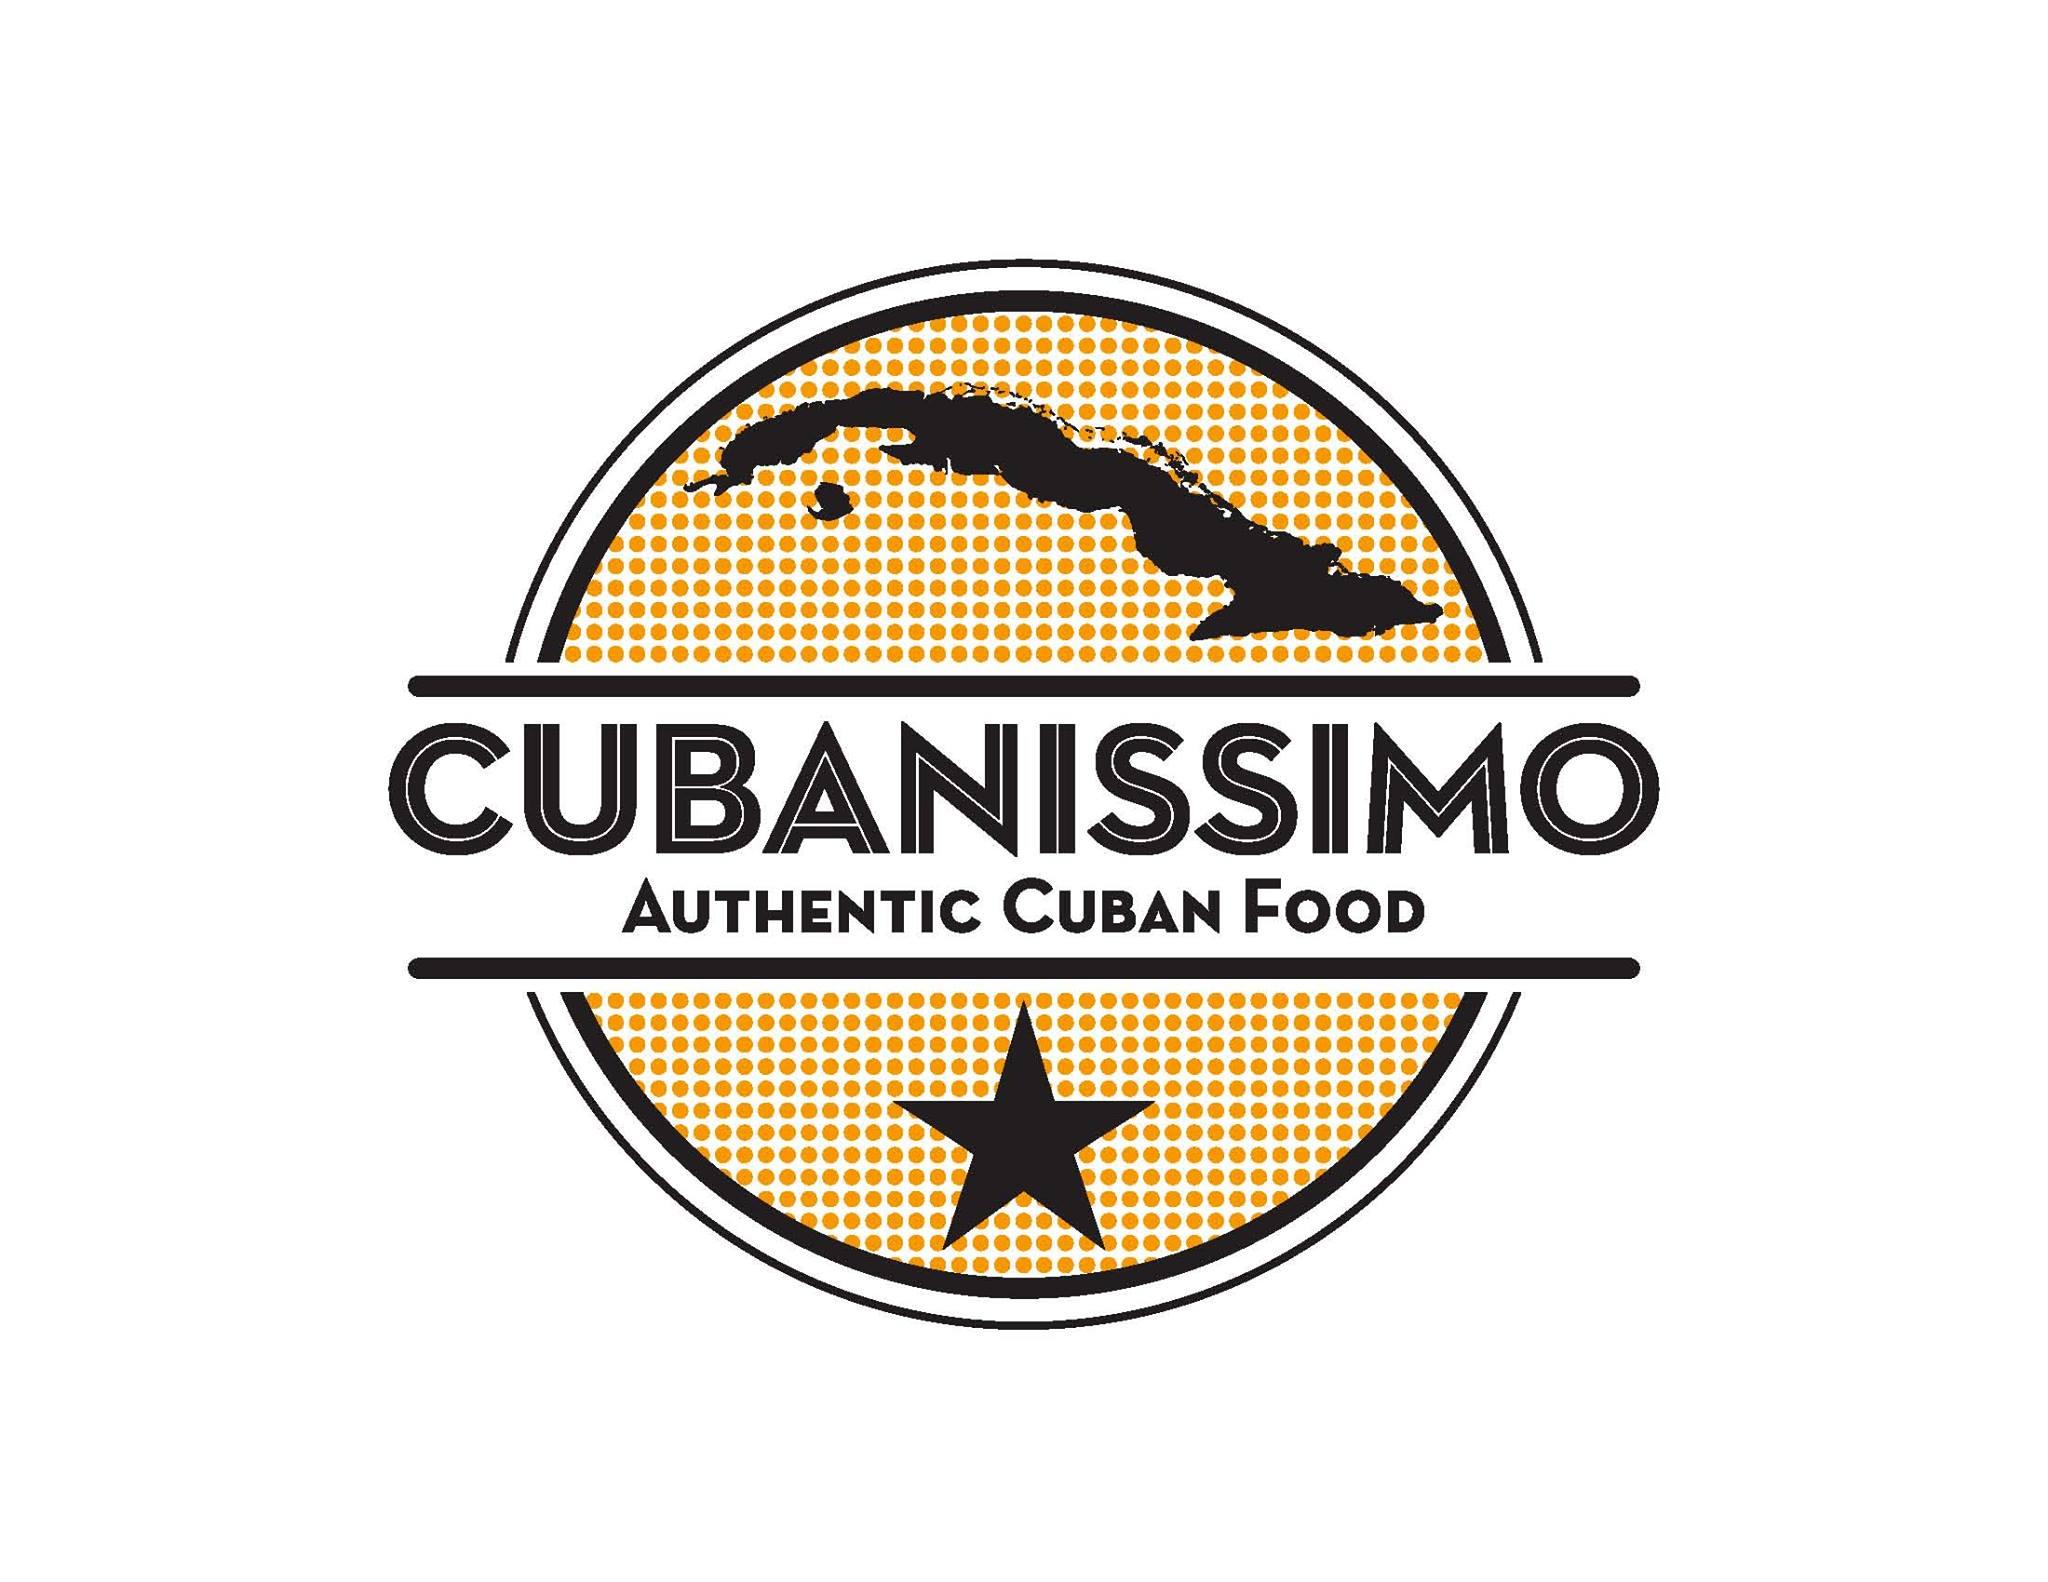 cubanissimo.jpg